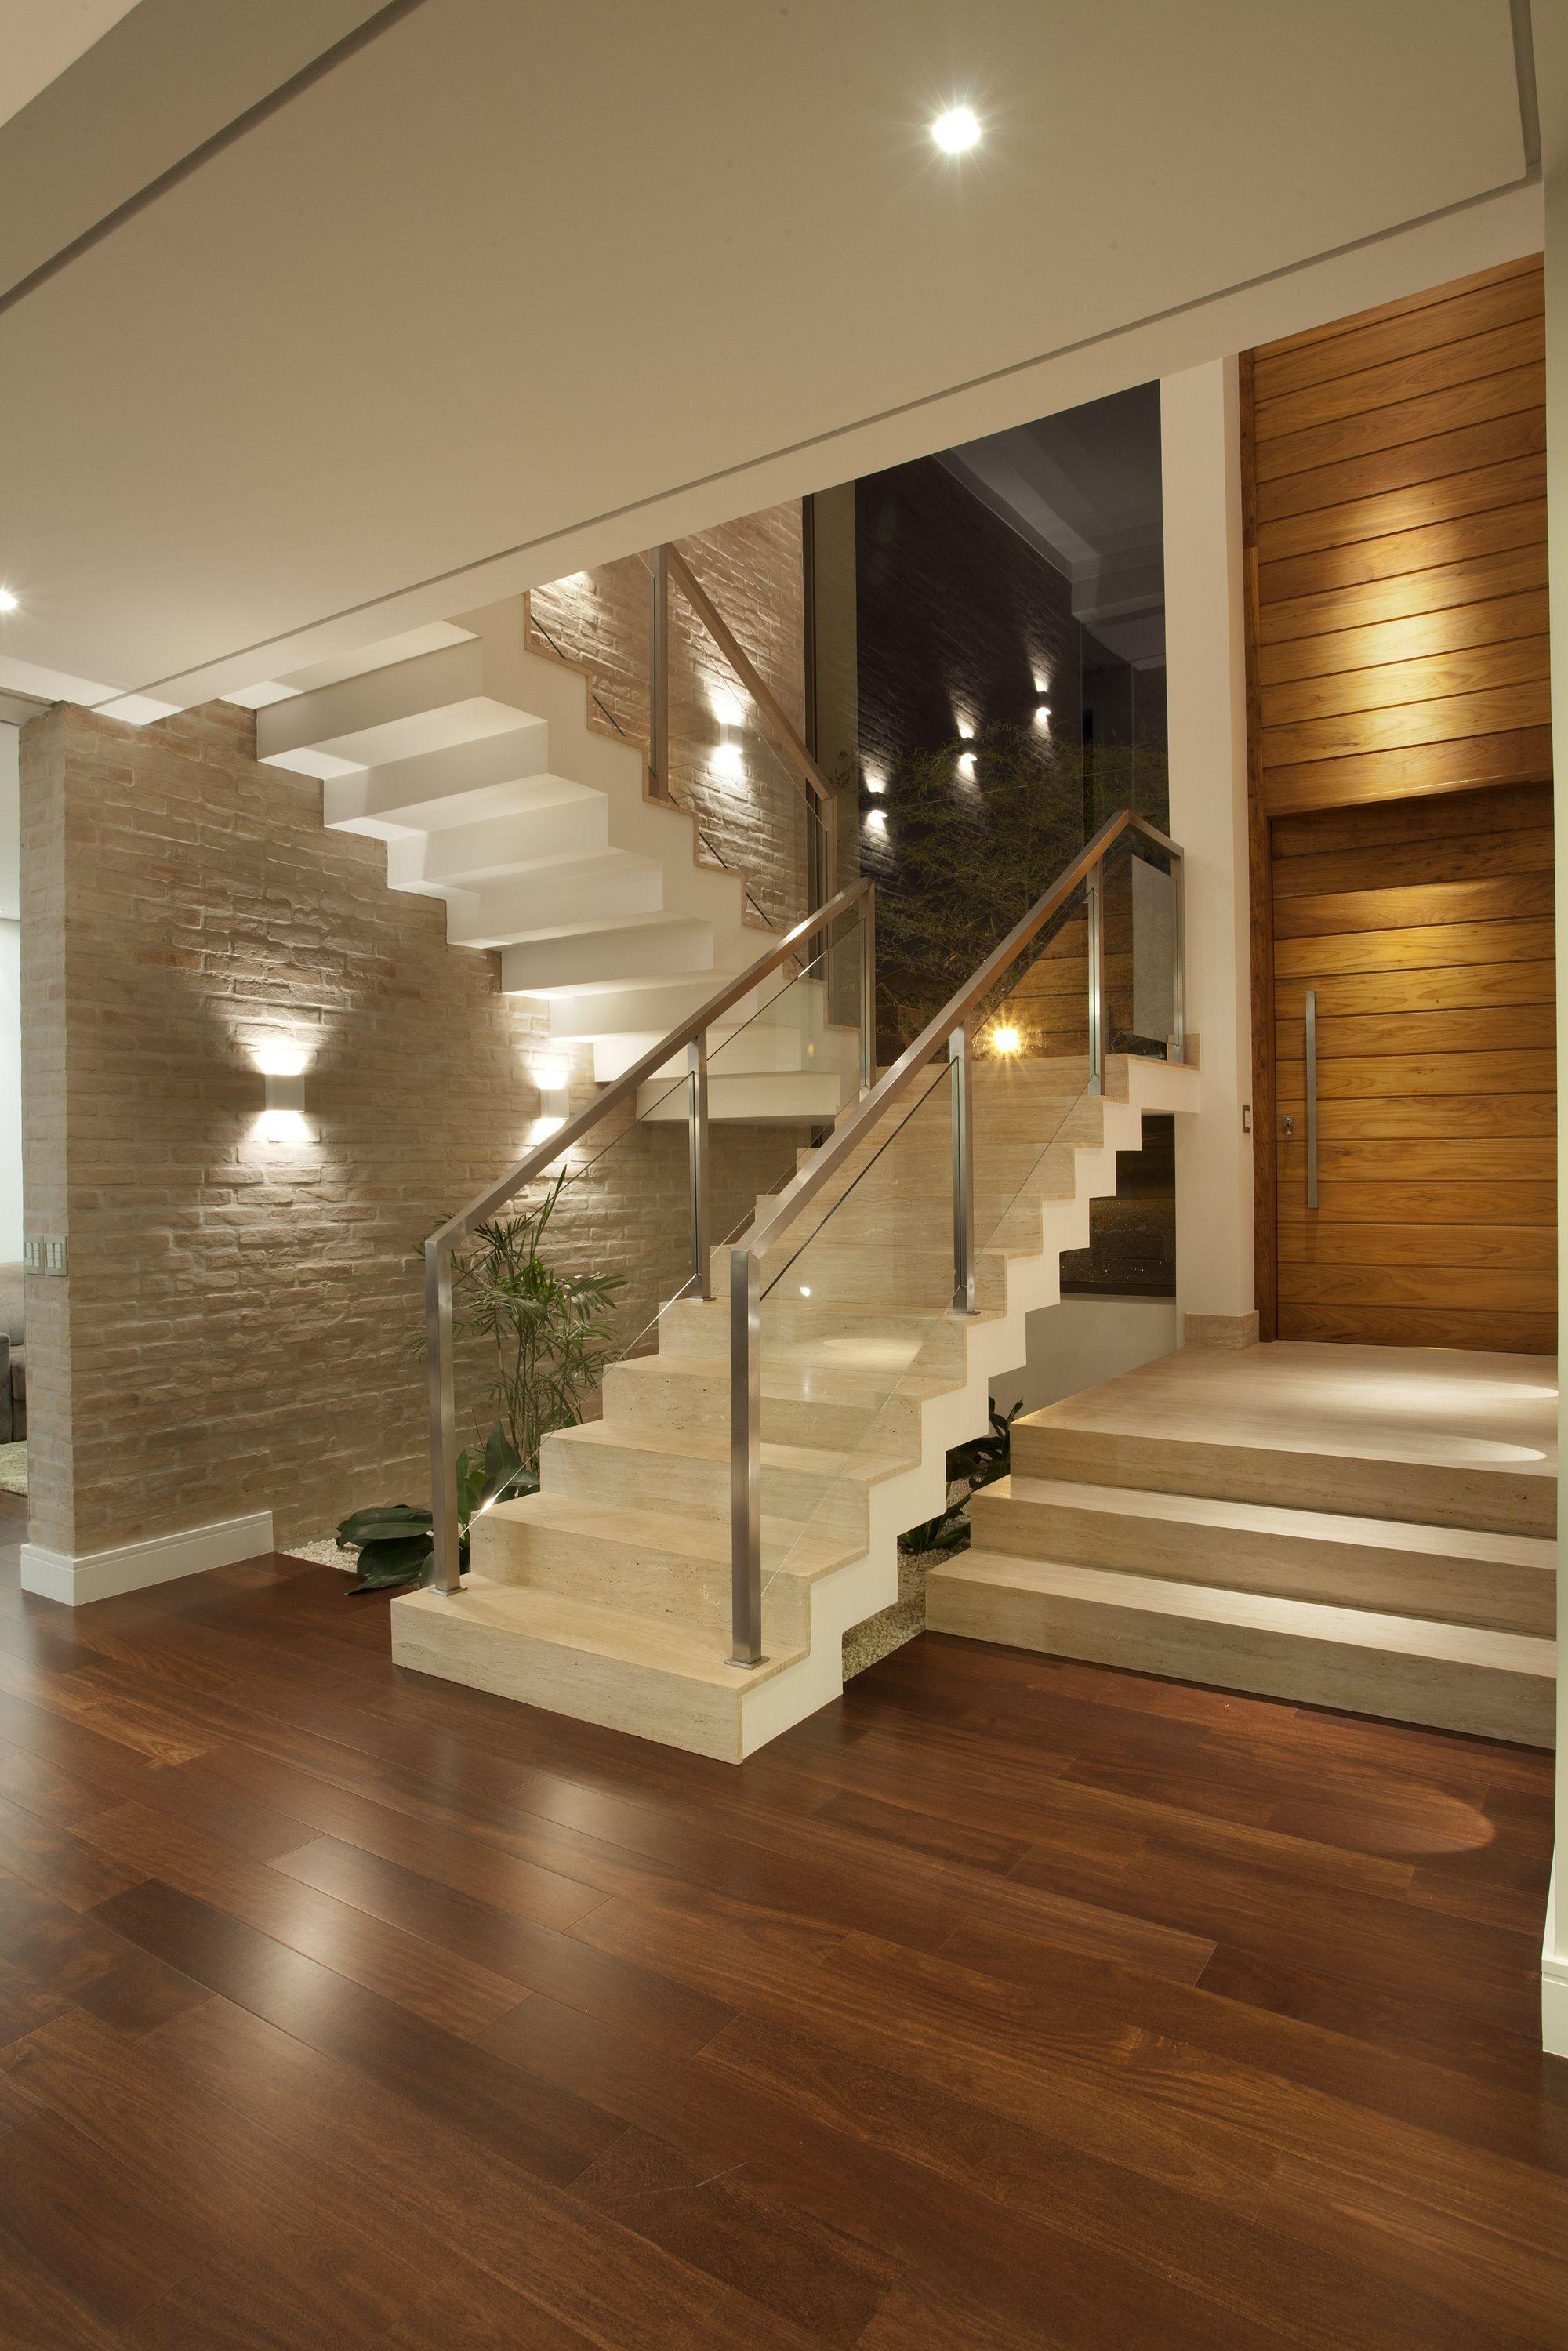 galeria de resid ncia df pupo gaspar arquitetura interiores 32 escadas pinterest. Black Bedroom Furniture Sets. Home Design Ideas